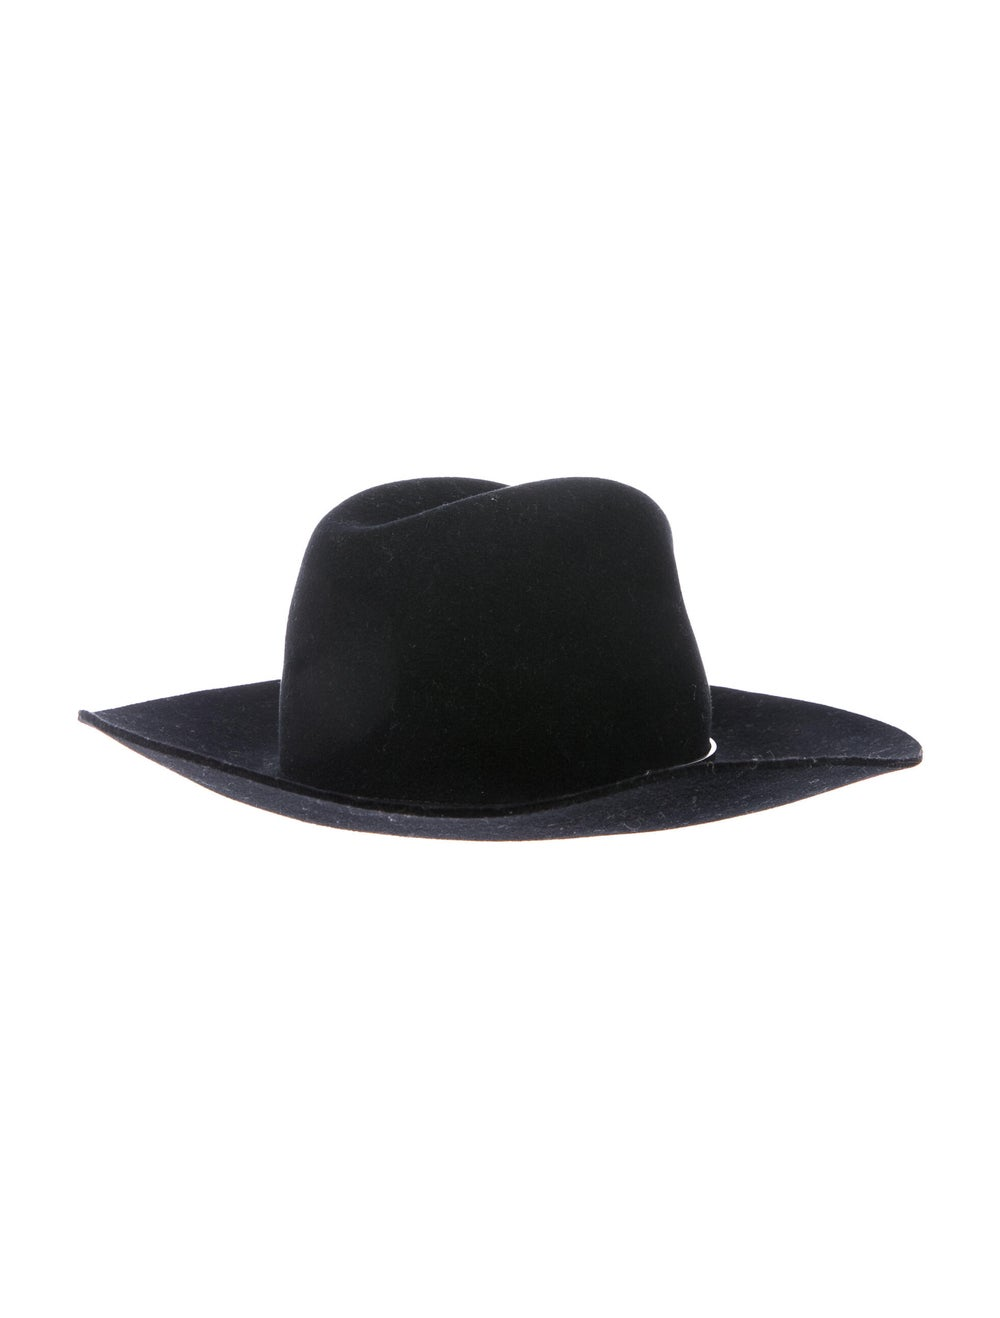 Janessa Leone Janessa Leone Wool Wide Brim Hat Bl… - image 2